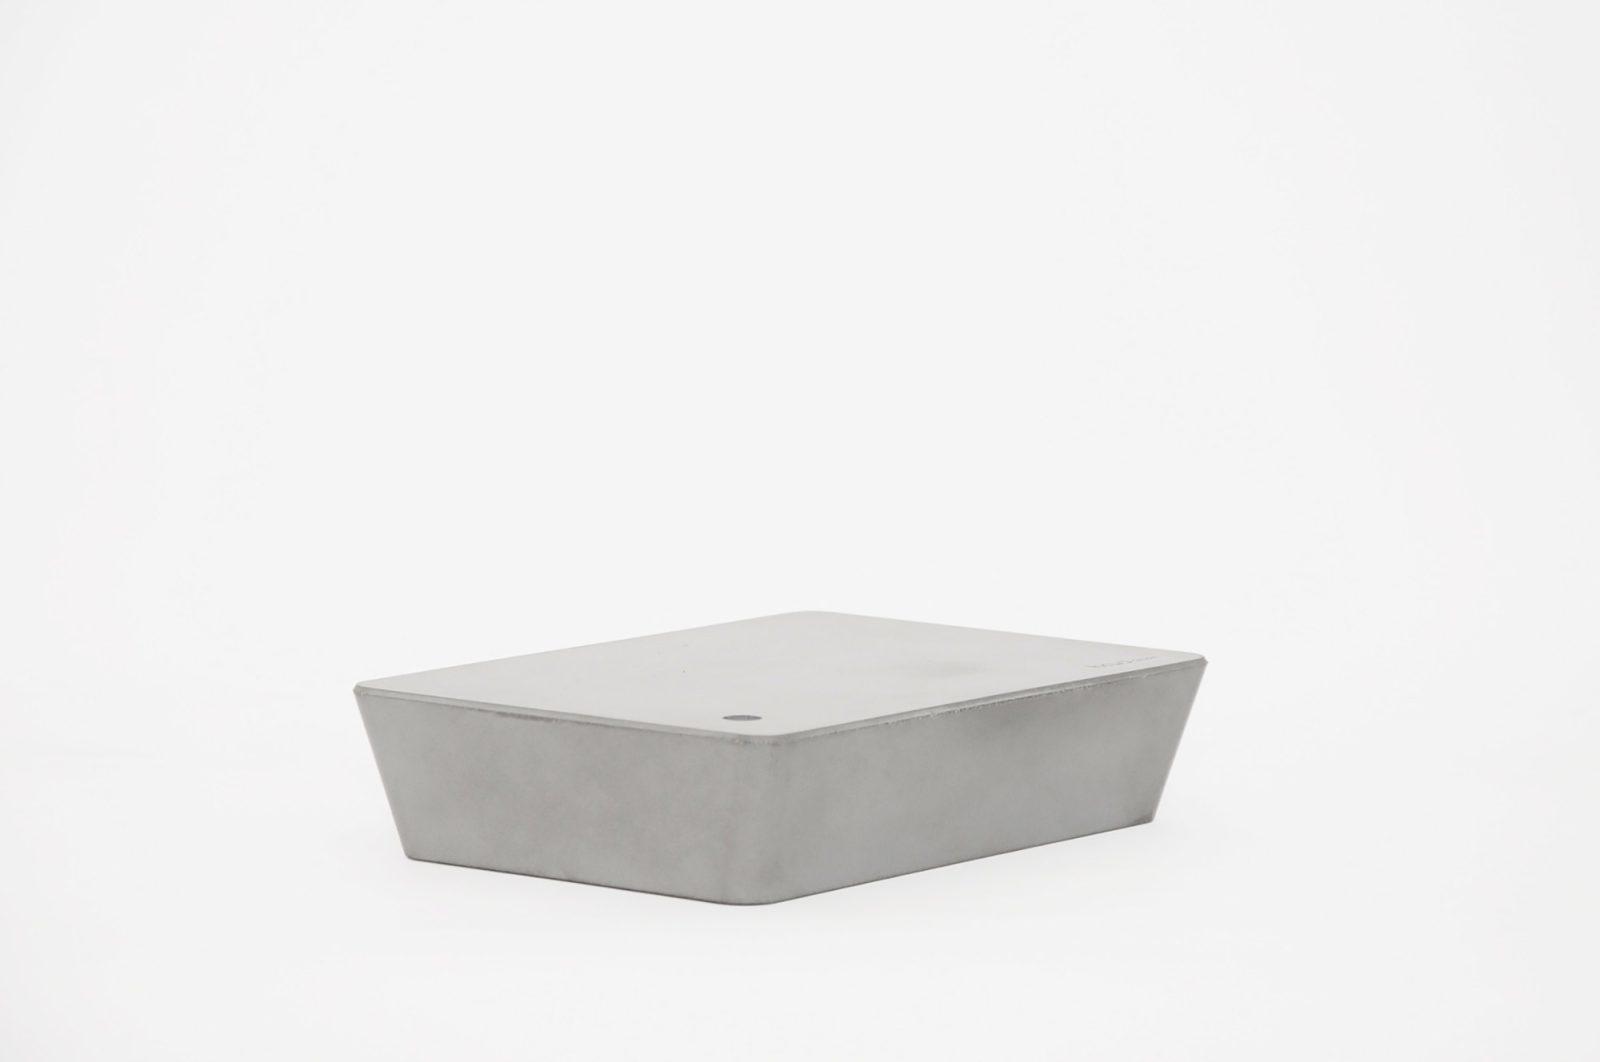 Concrete Brick Lamp – Original Dark Gray-31282